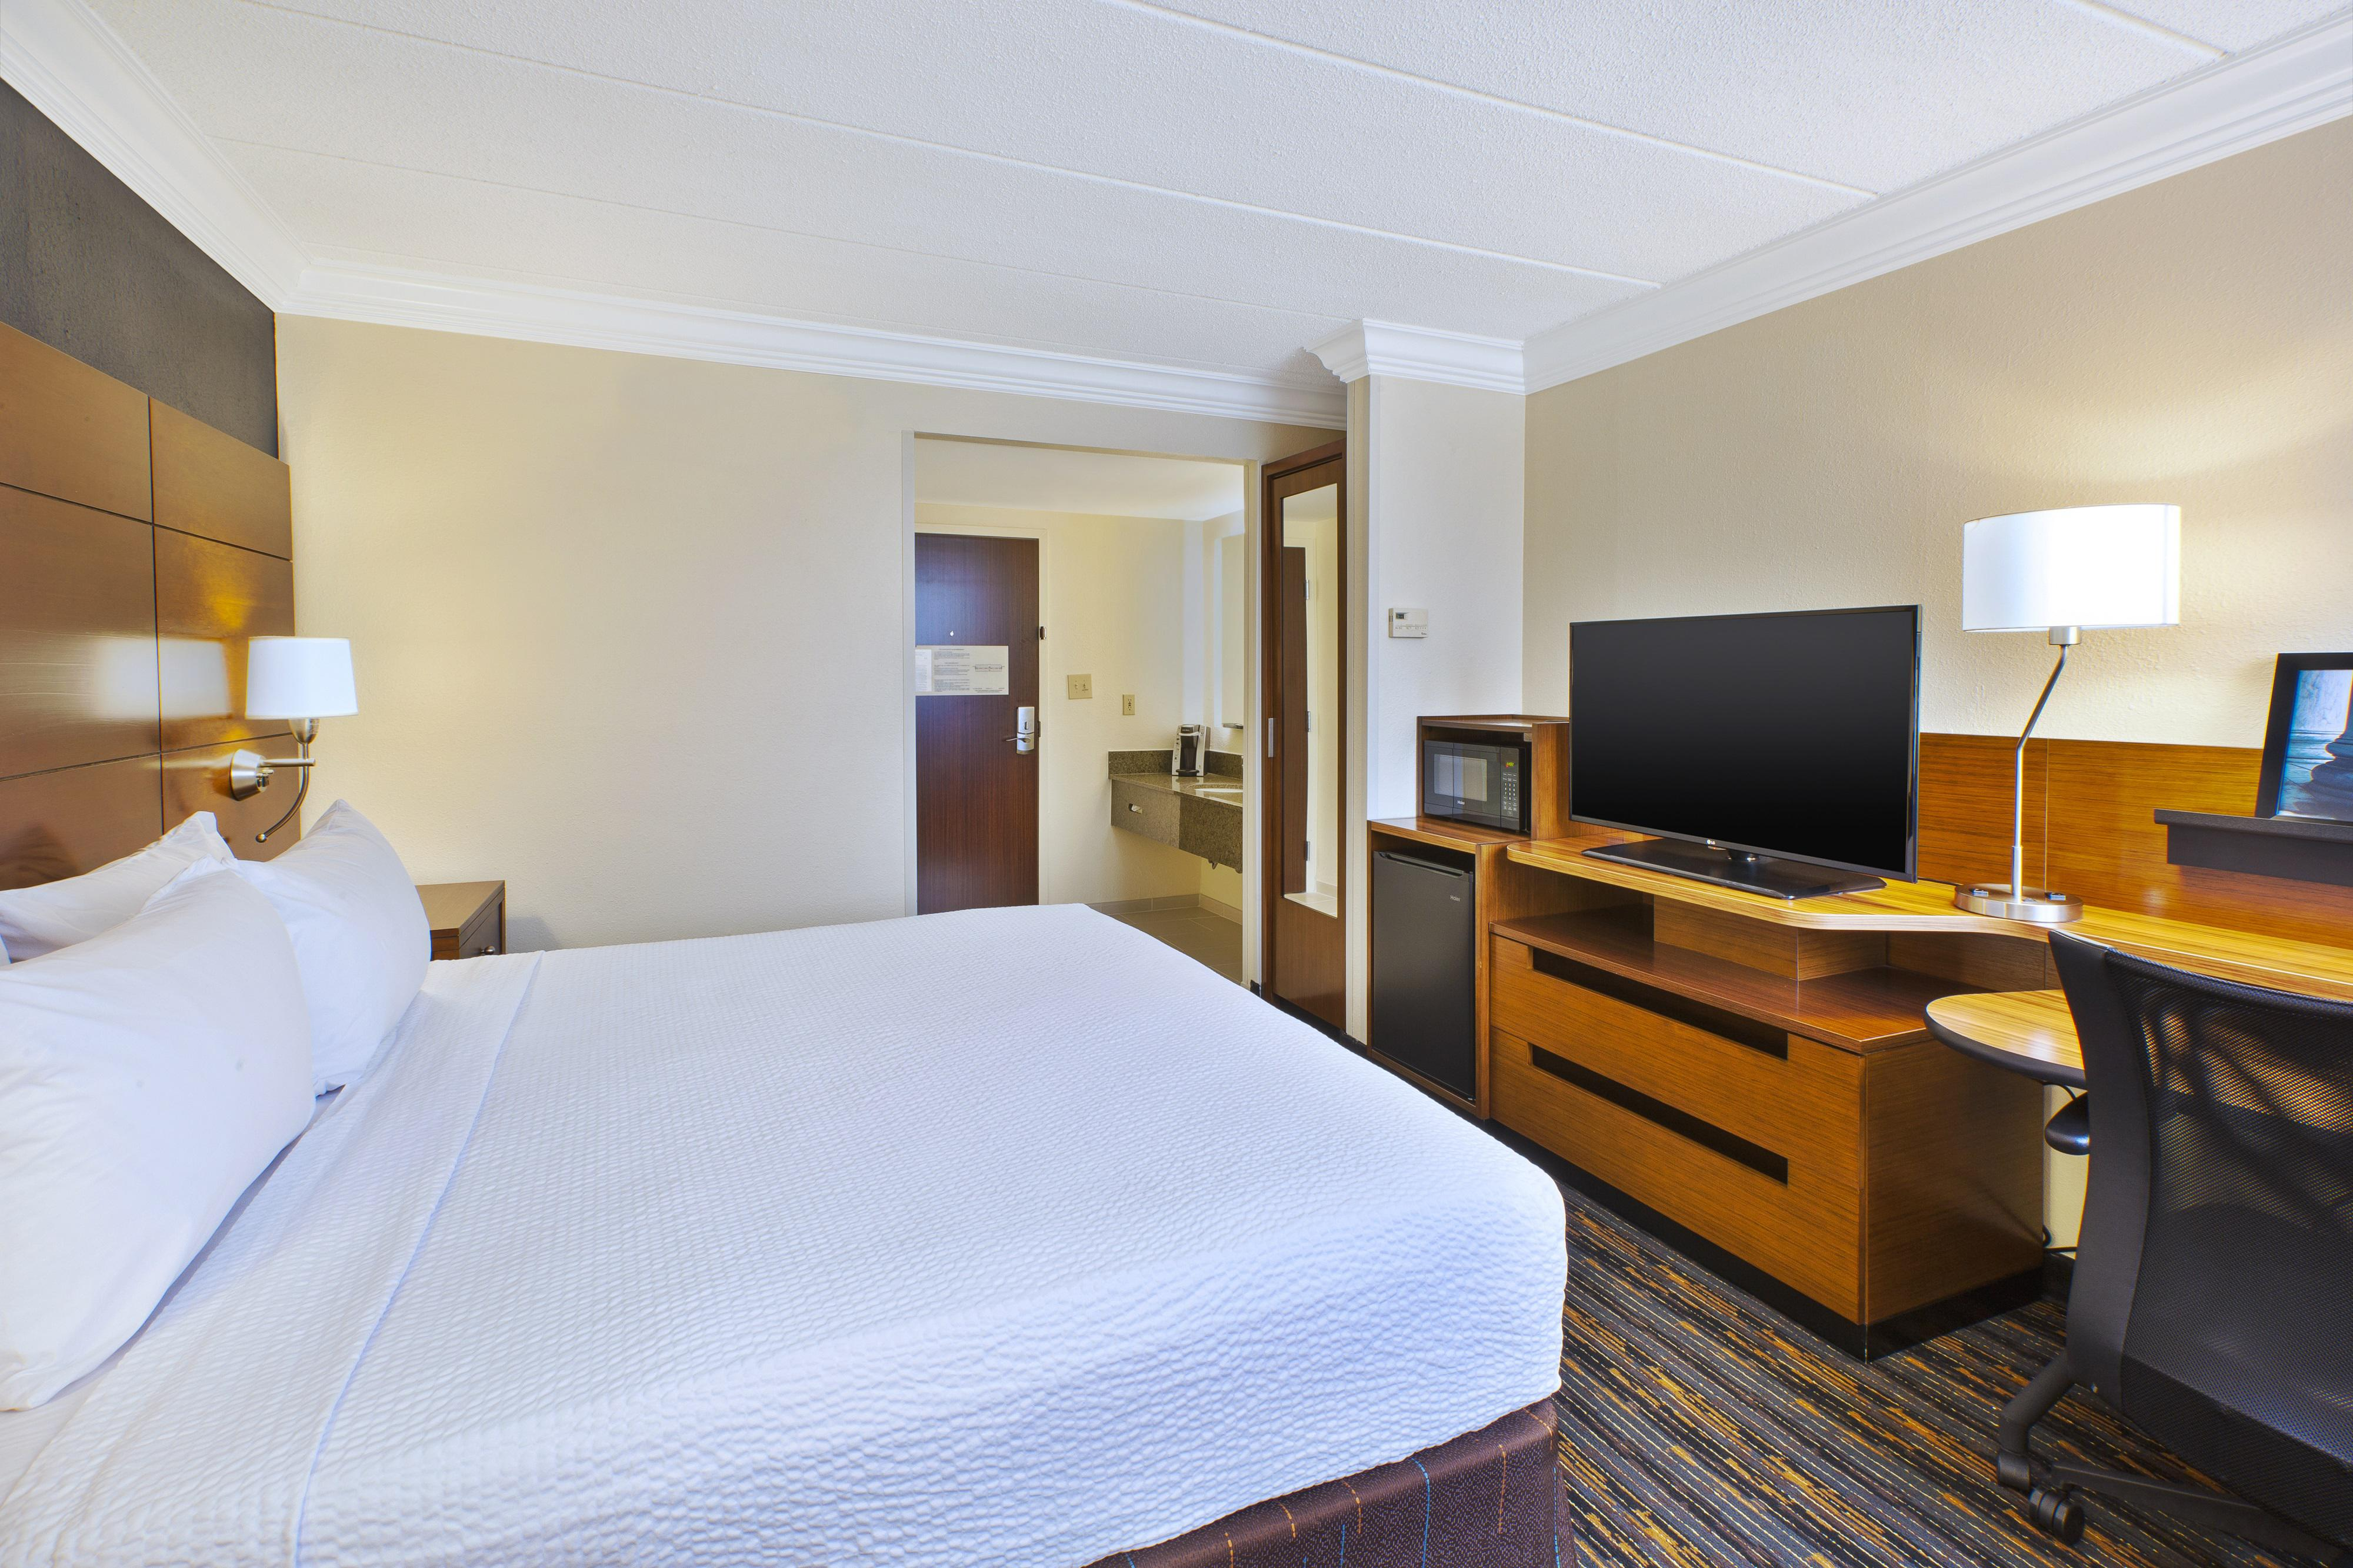 Fairfield Inn & Suites by Marriott Dulles Airport Herndon/Reston image 13